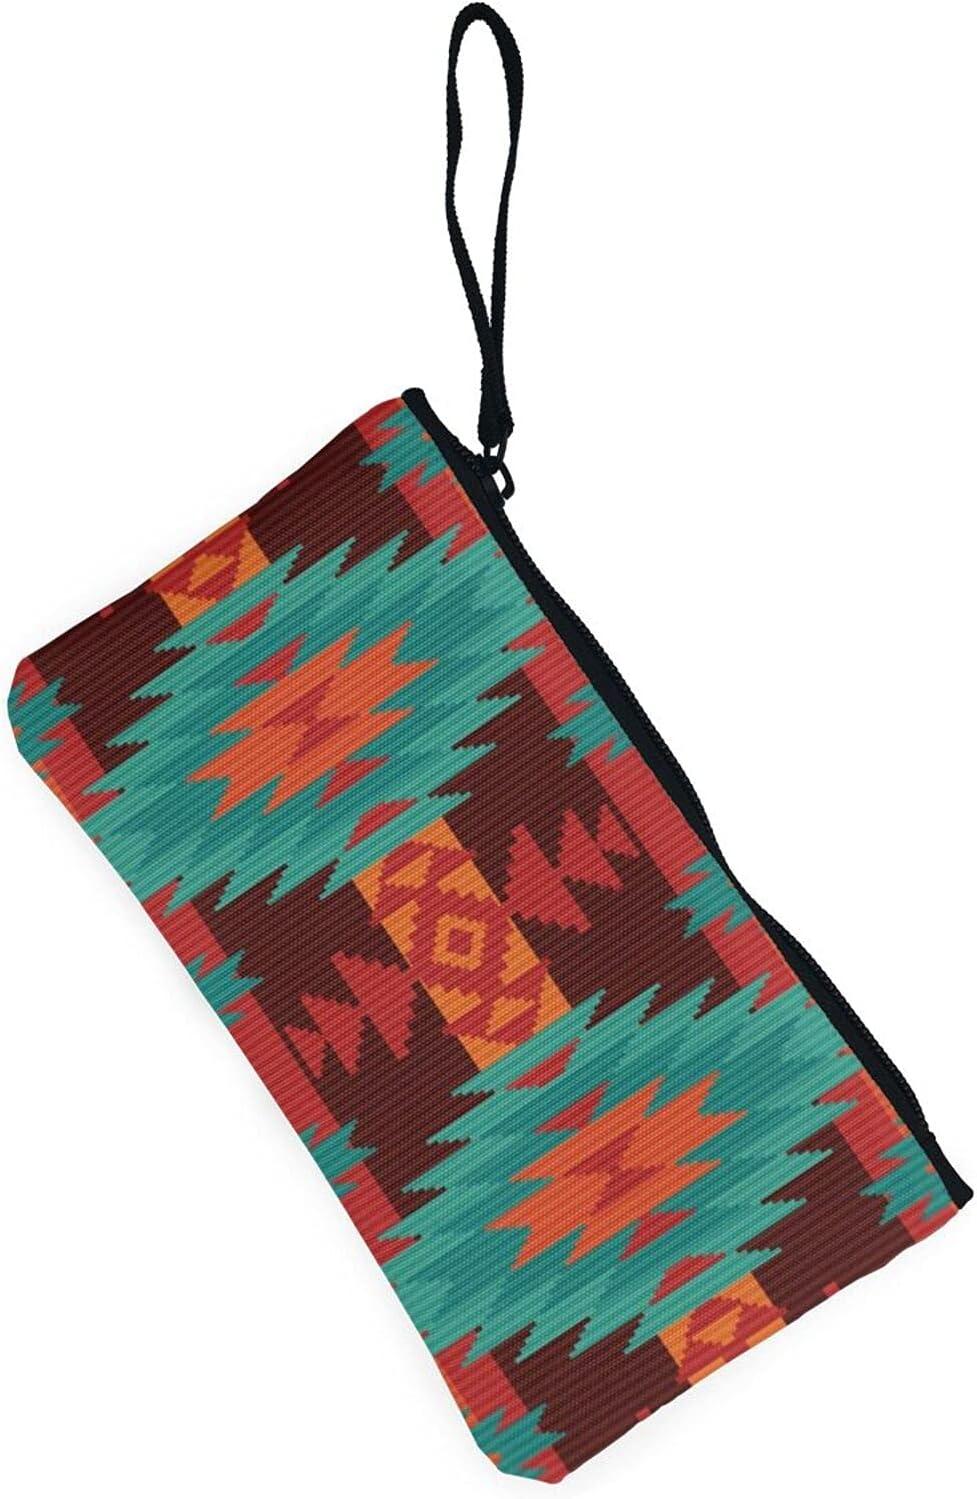 AORRUAM Geometric retro pattern Canvas Coin Purse,Canvas Zipper Pencil Cases,Canvas Change Purse Pouch Mini Wallet Coin Bag